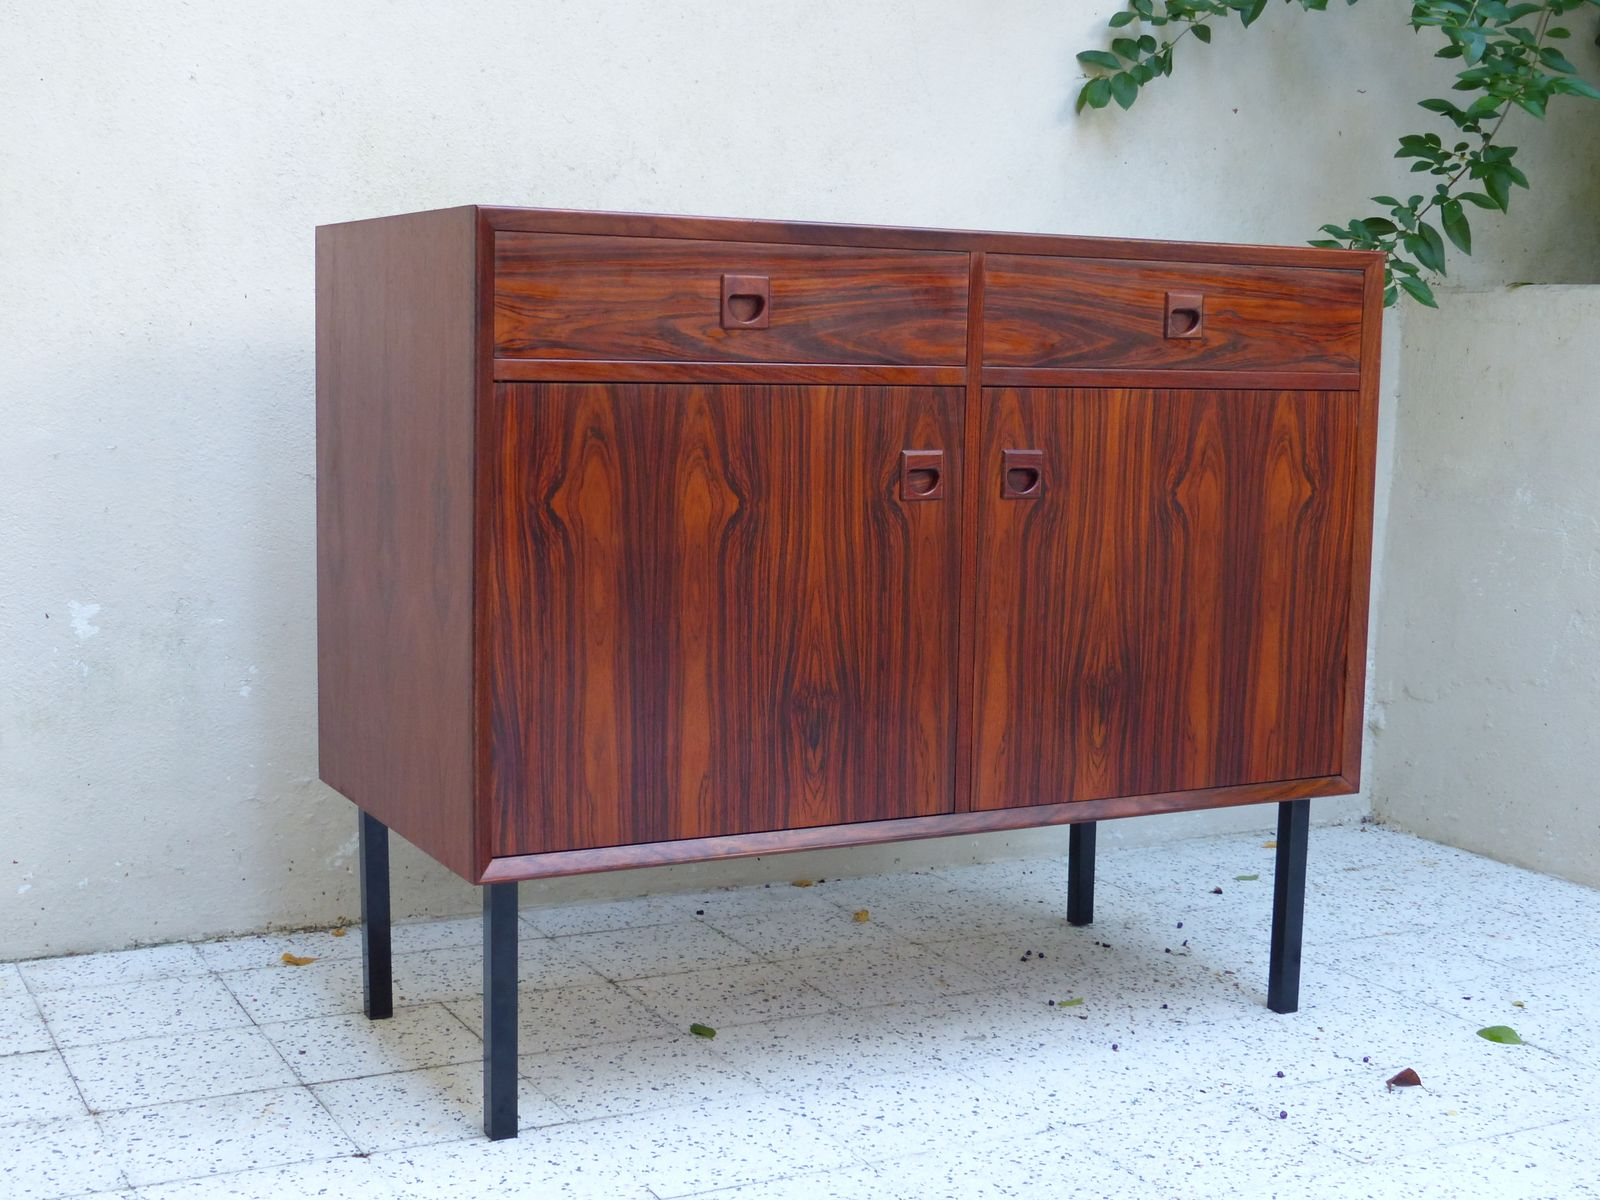 skandinavisches vintage rio palisander sideboard bei. Black Bedroom Furniture Sets. Home Design Ideas